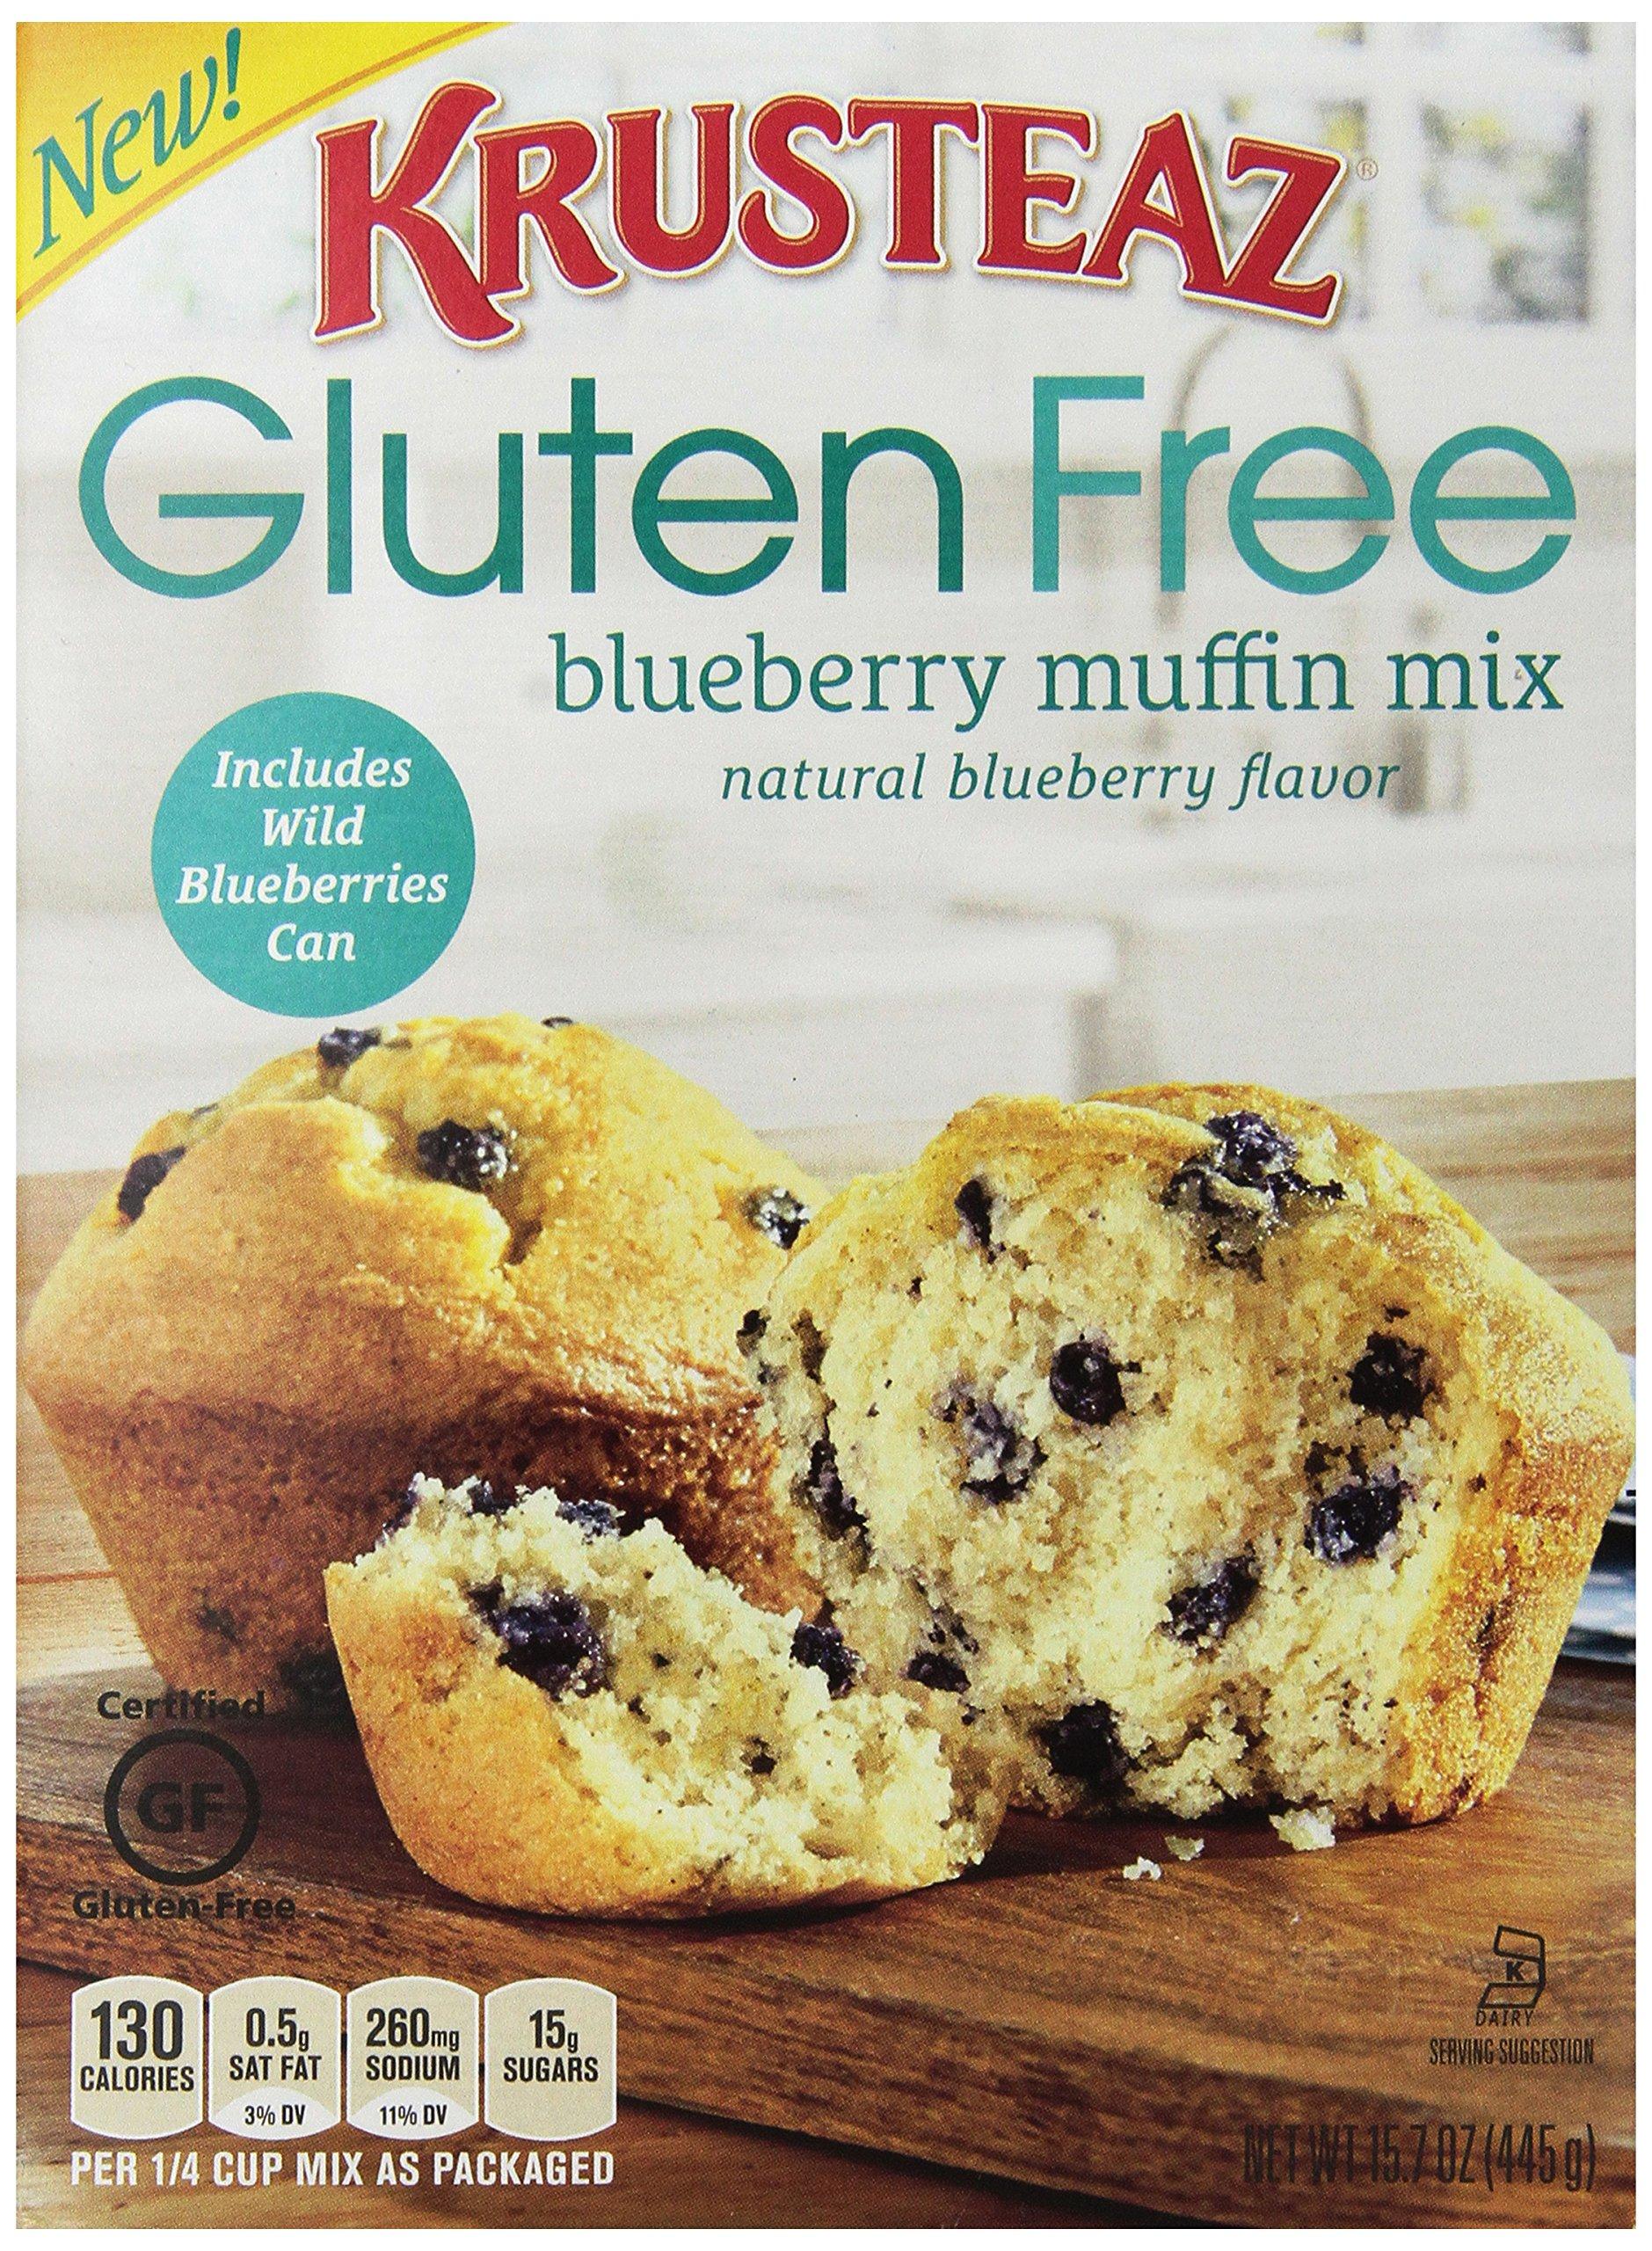 Krusteaz Gluten Free Blueberry Muffin Mix, 15.7-Ounce Box